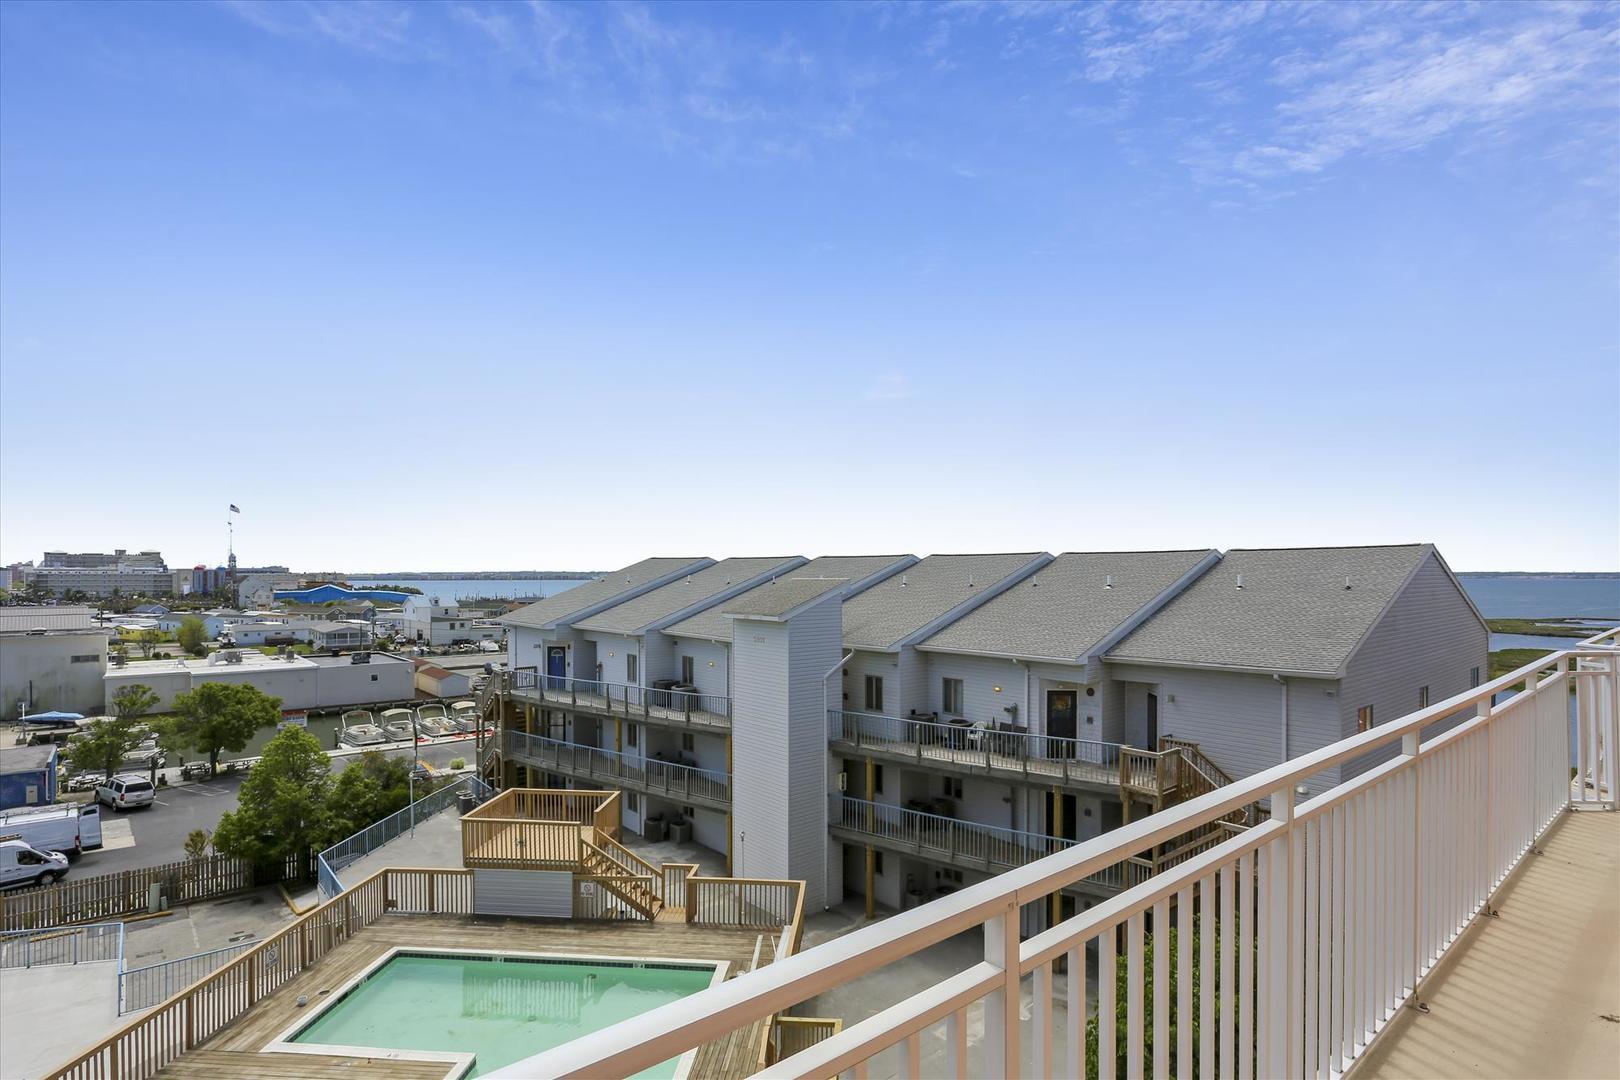 Sunset Bay II 518 - Balcony View